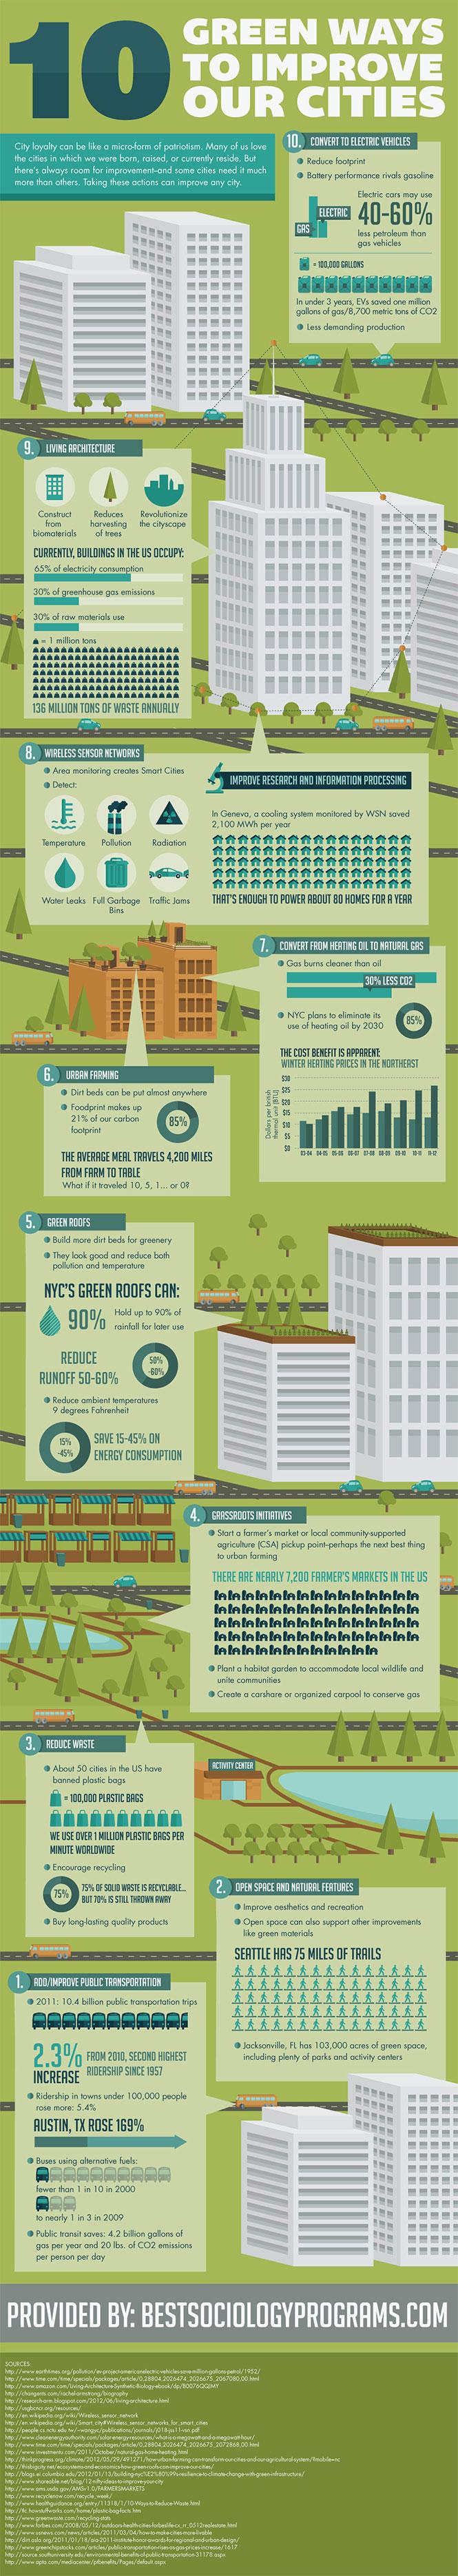 10 Green Ways to Improve Cities